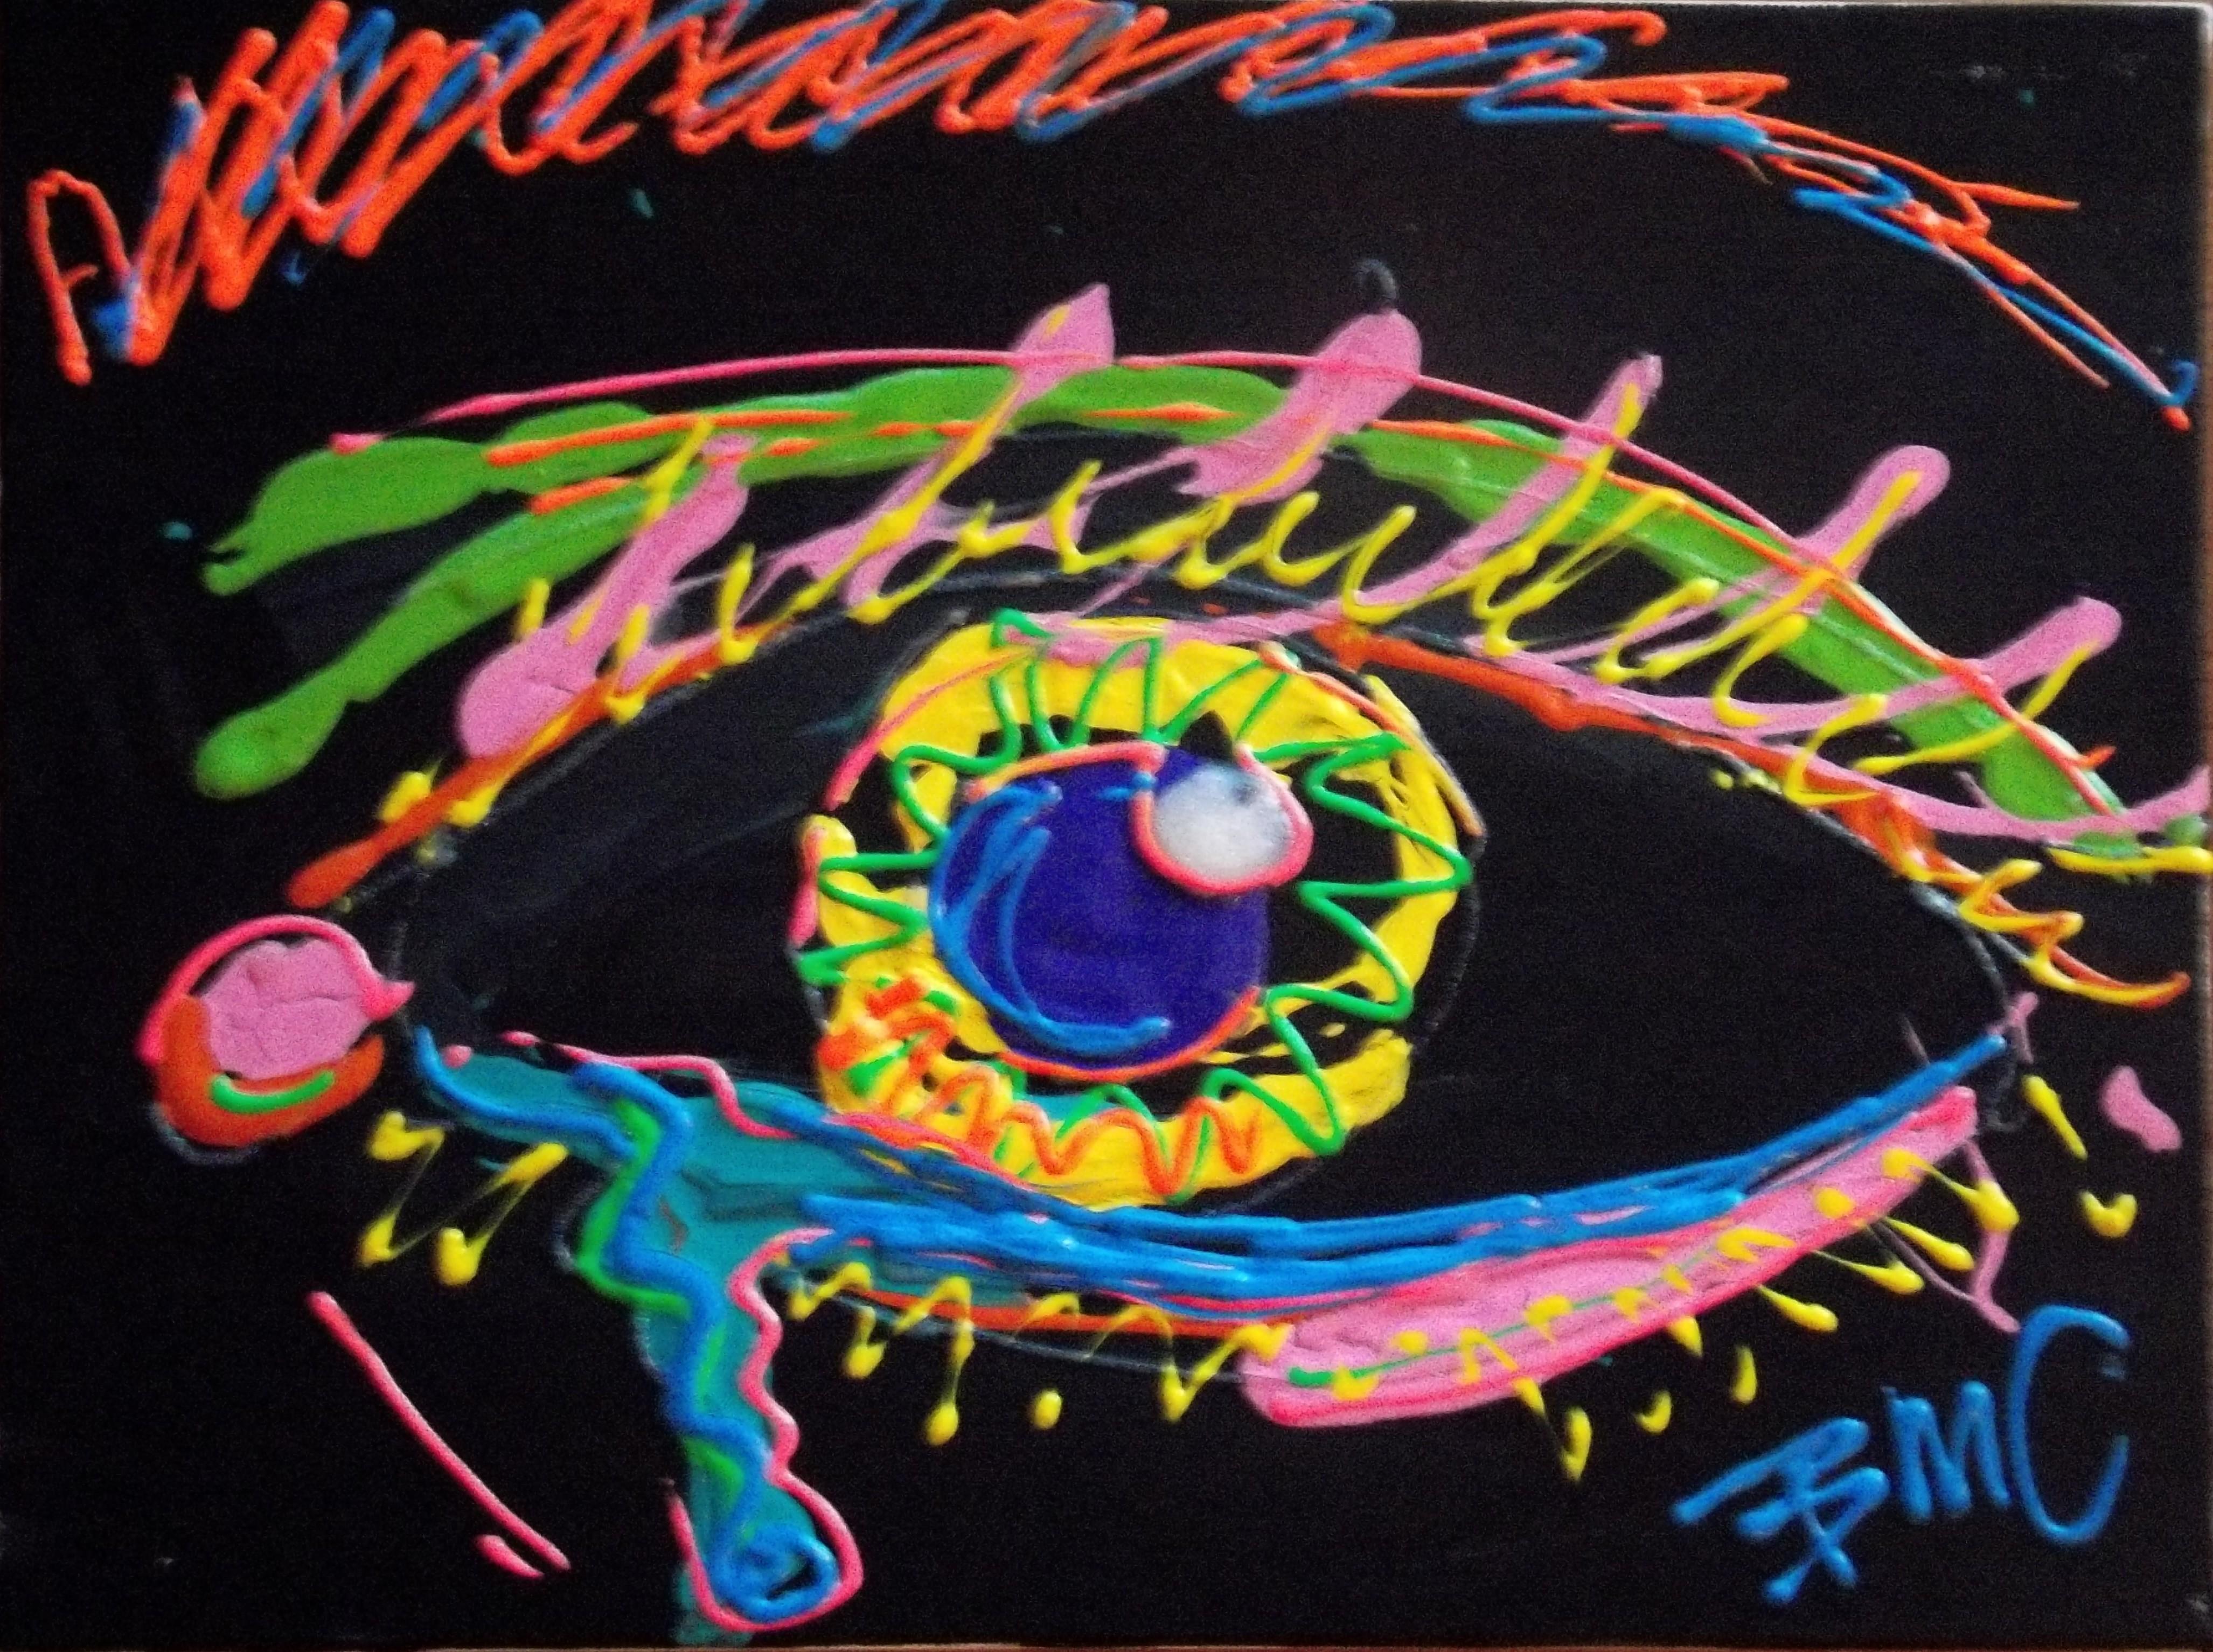 Neon 3D Painting!!! | ColemanInk Artworks